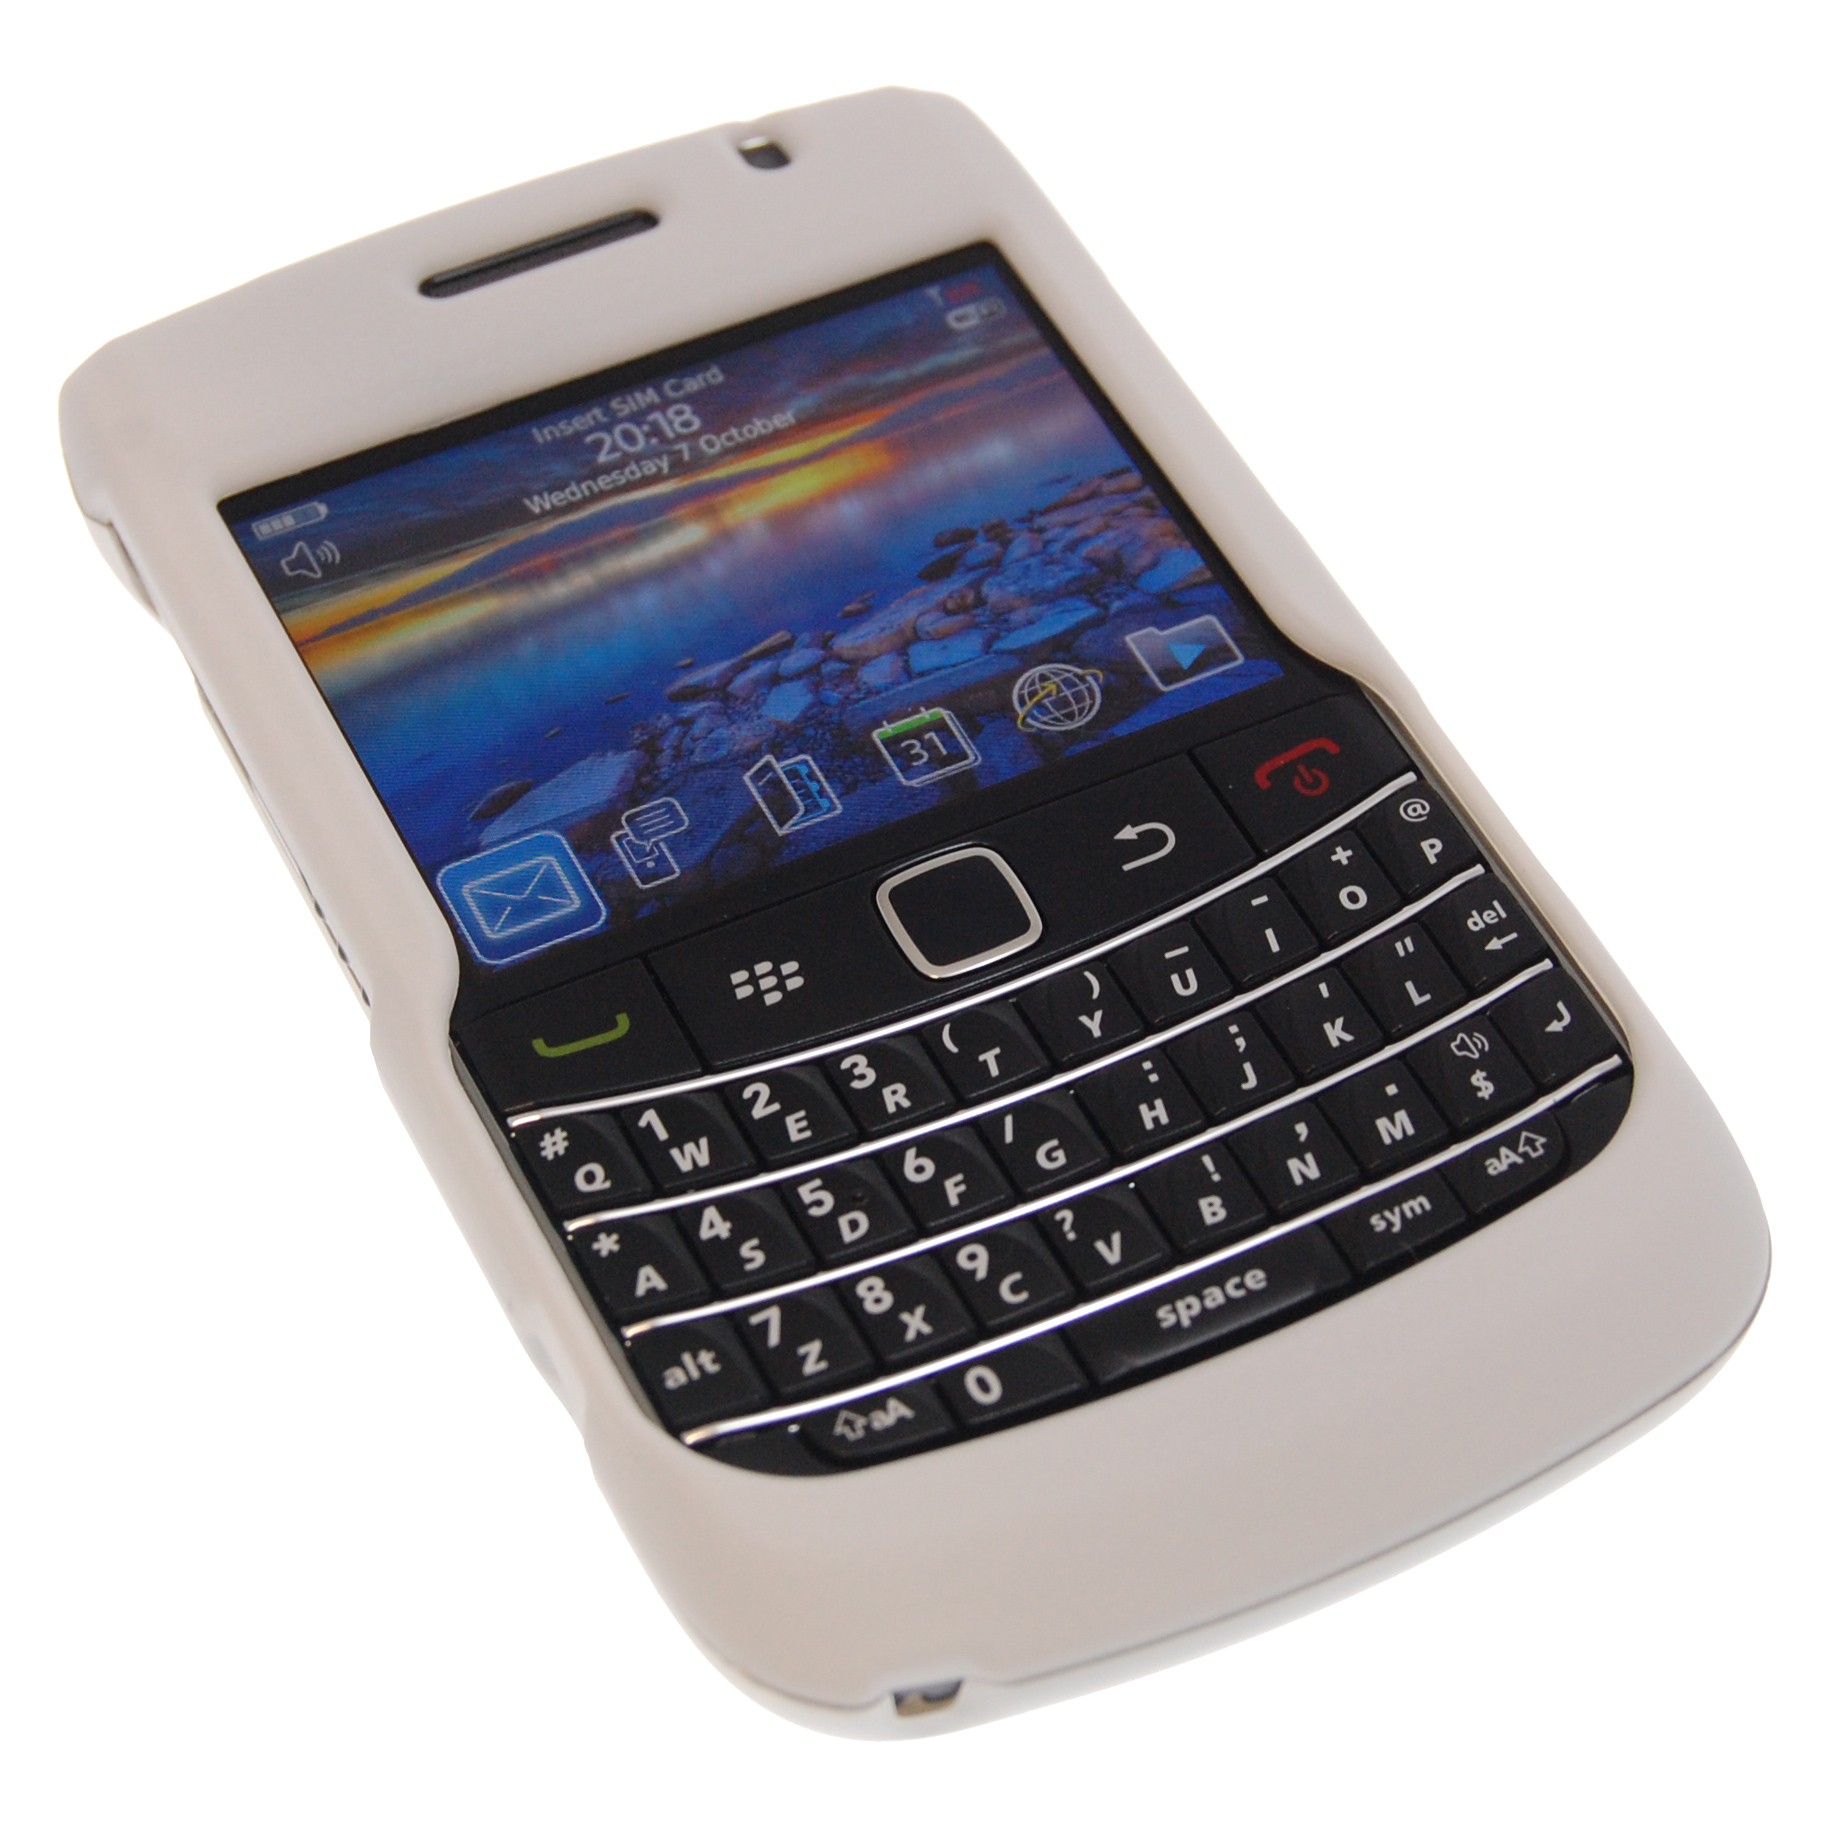 blackberry curve 9700 white - photo #29